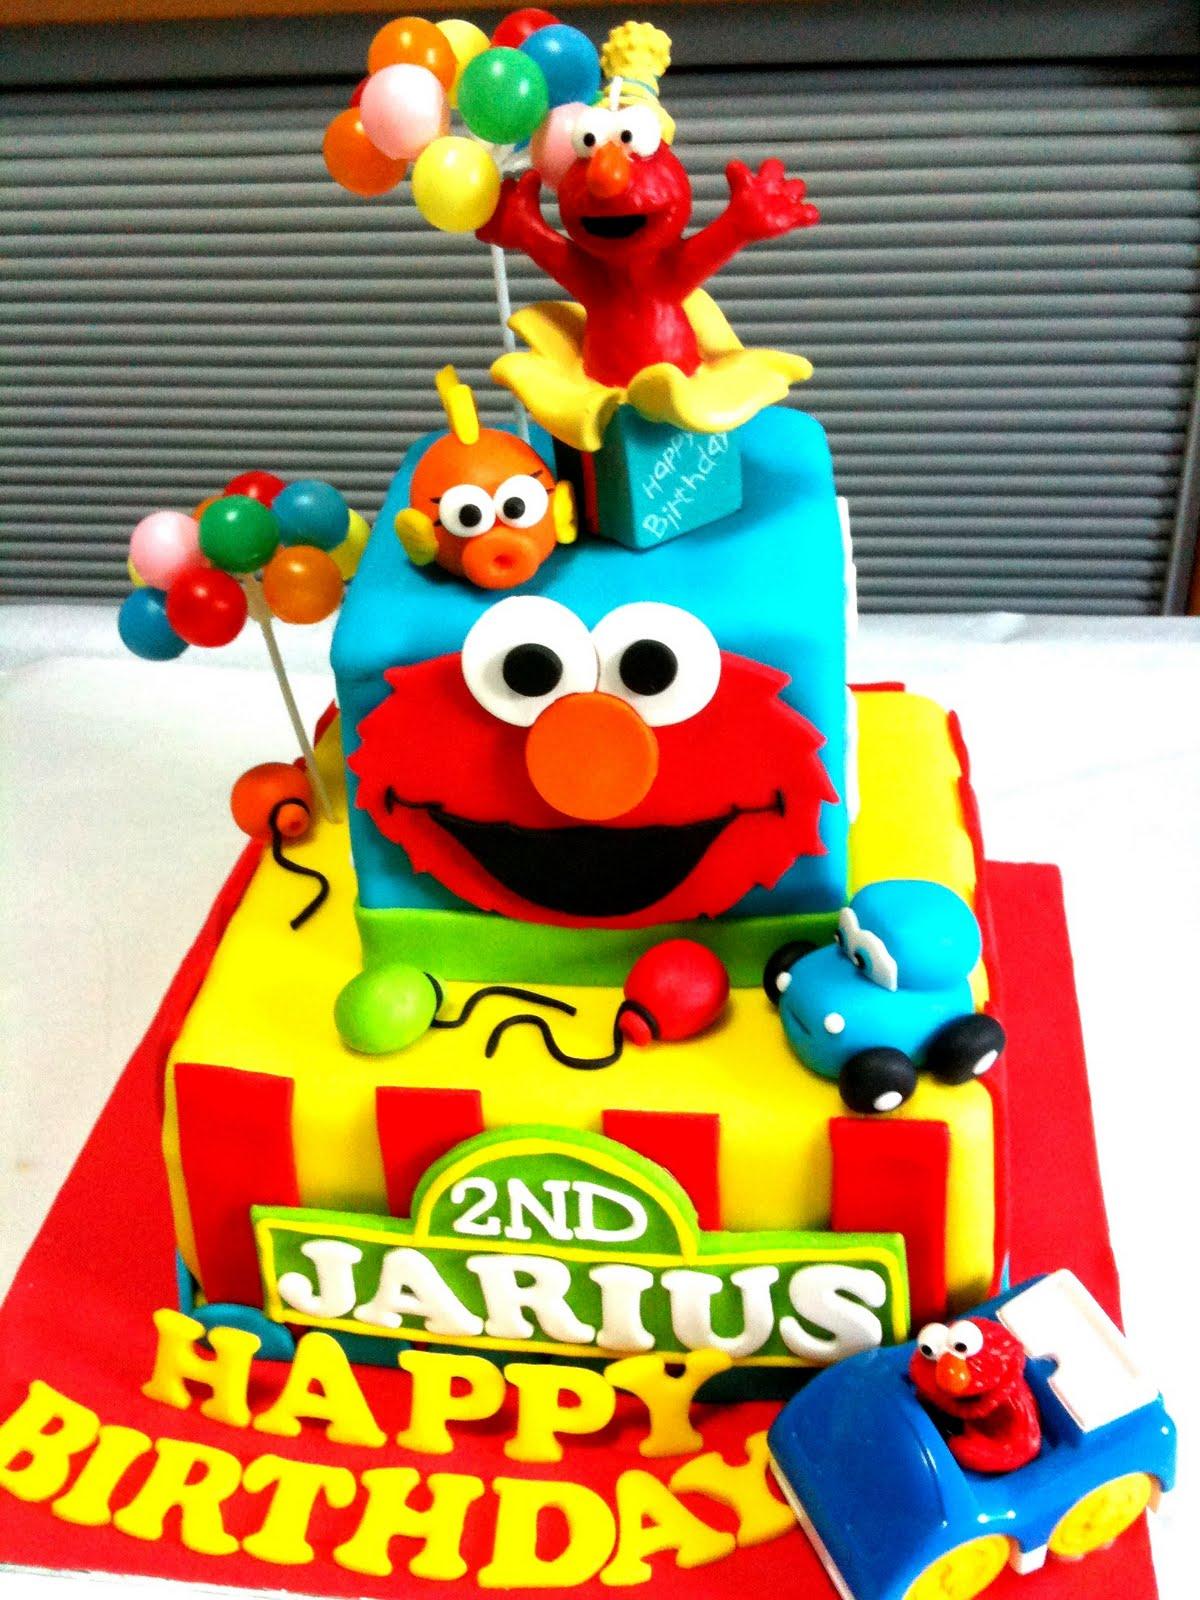 Oven Creations Happy 2nd Birthday Jarius